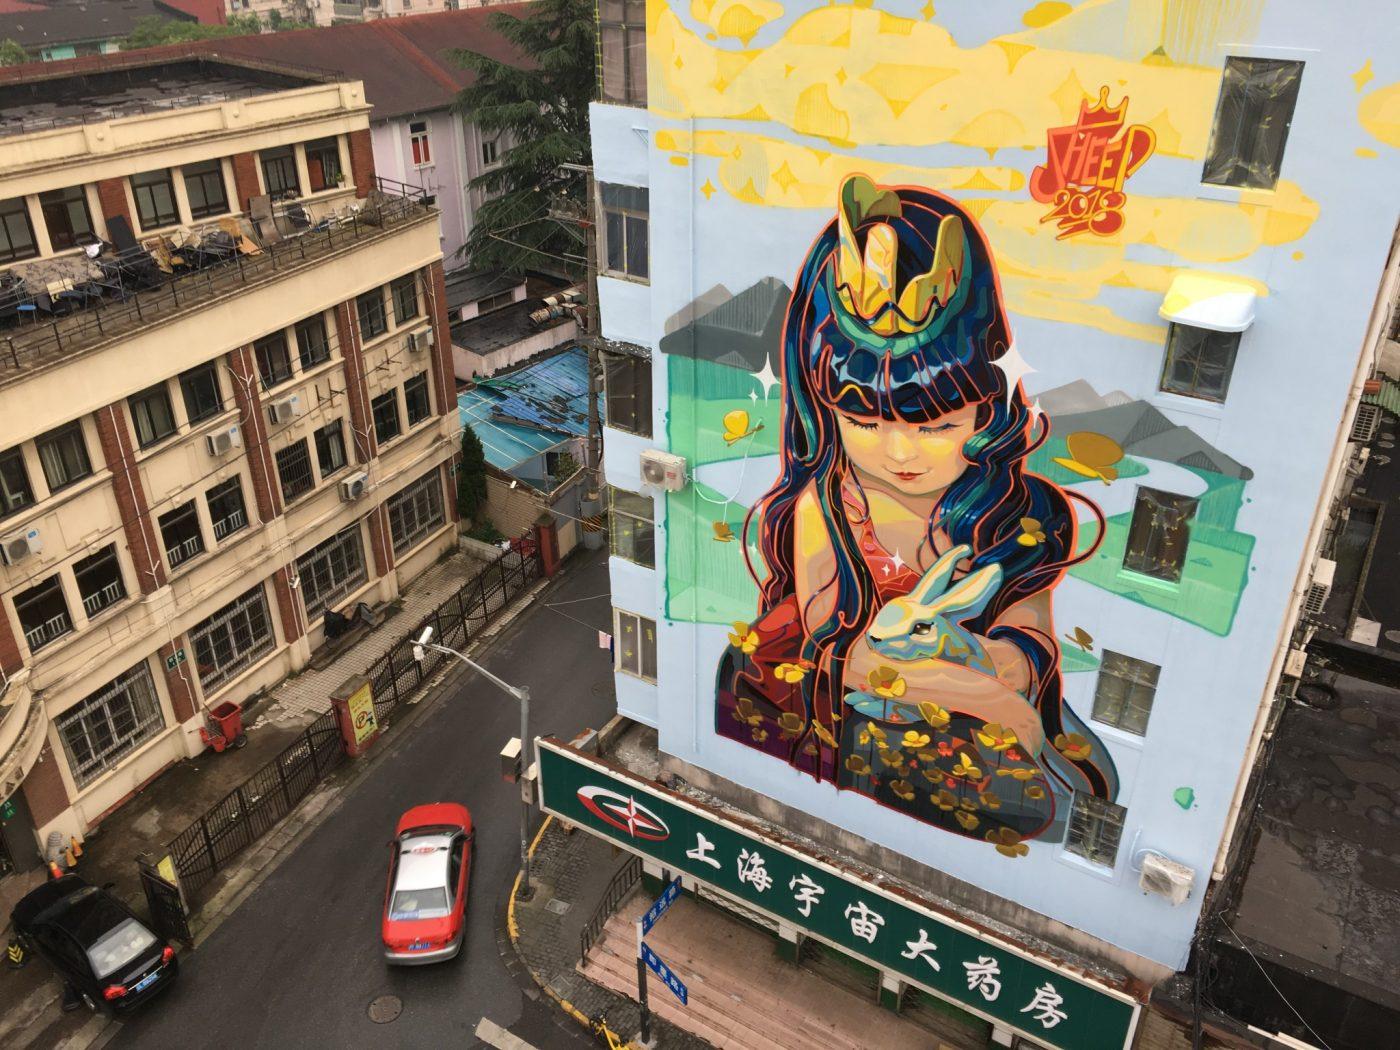 Sheep Chen Streetartist China